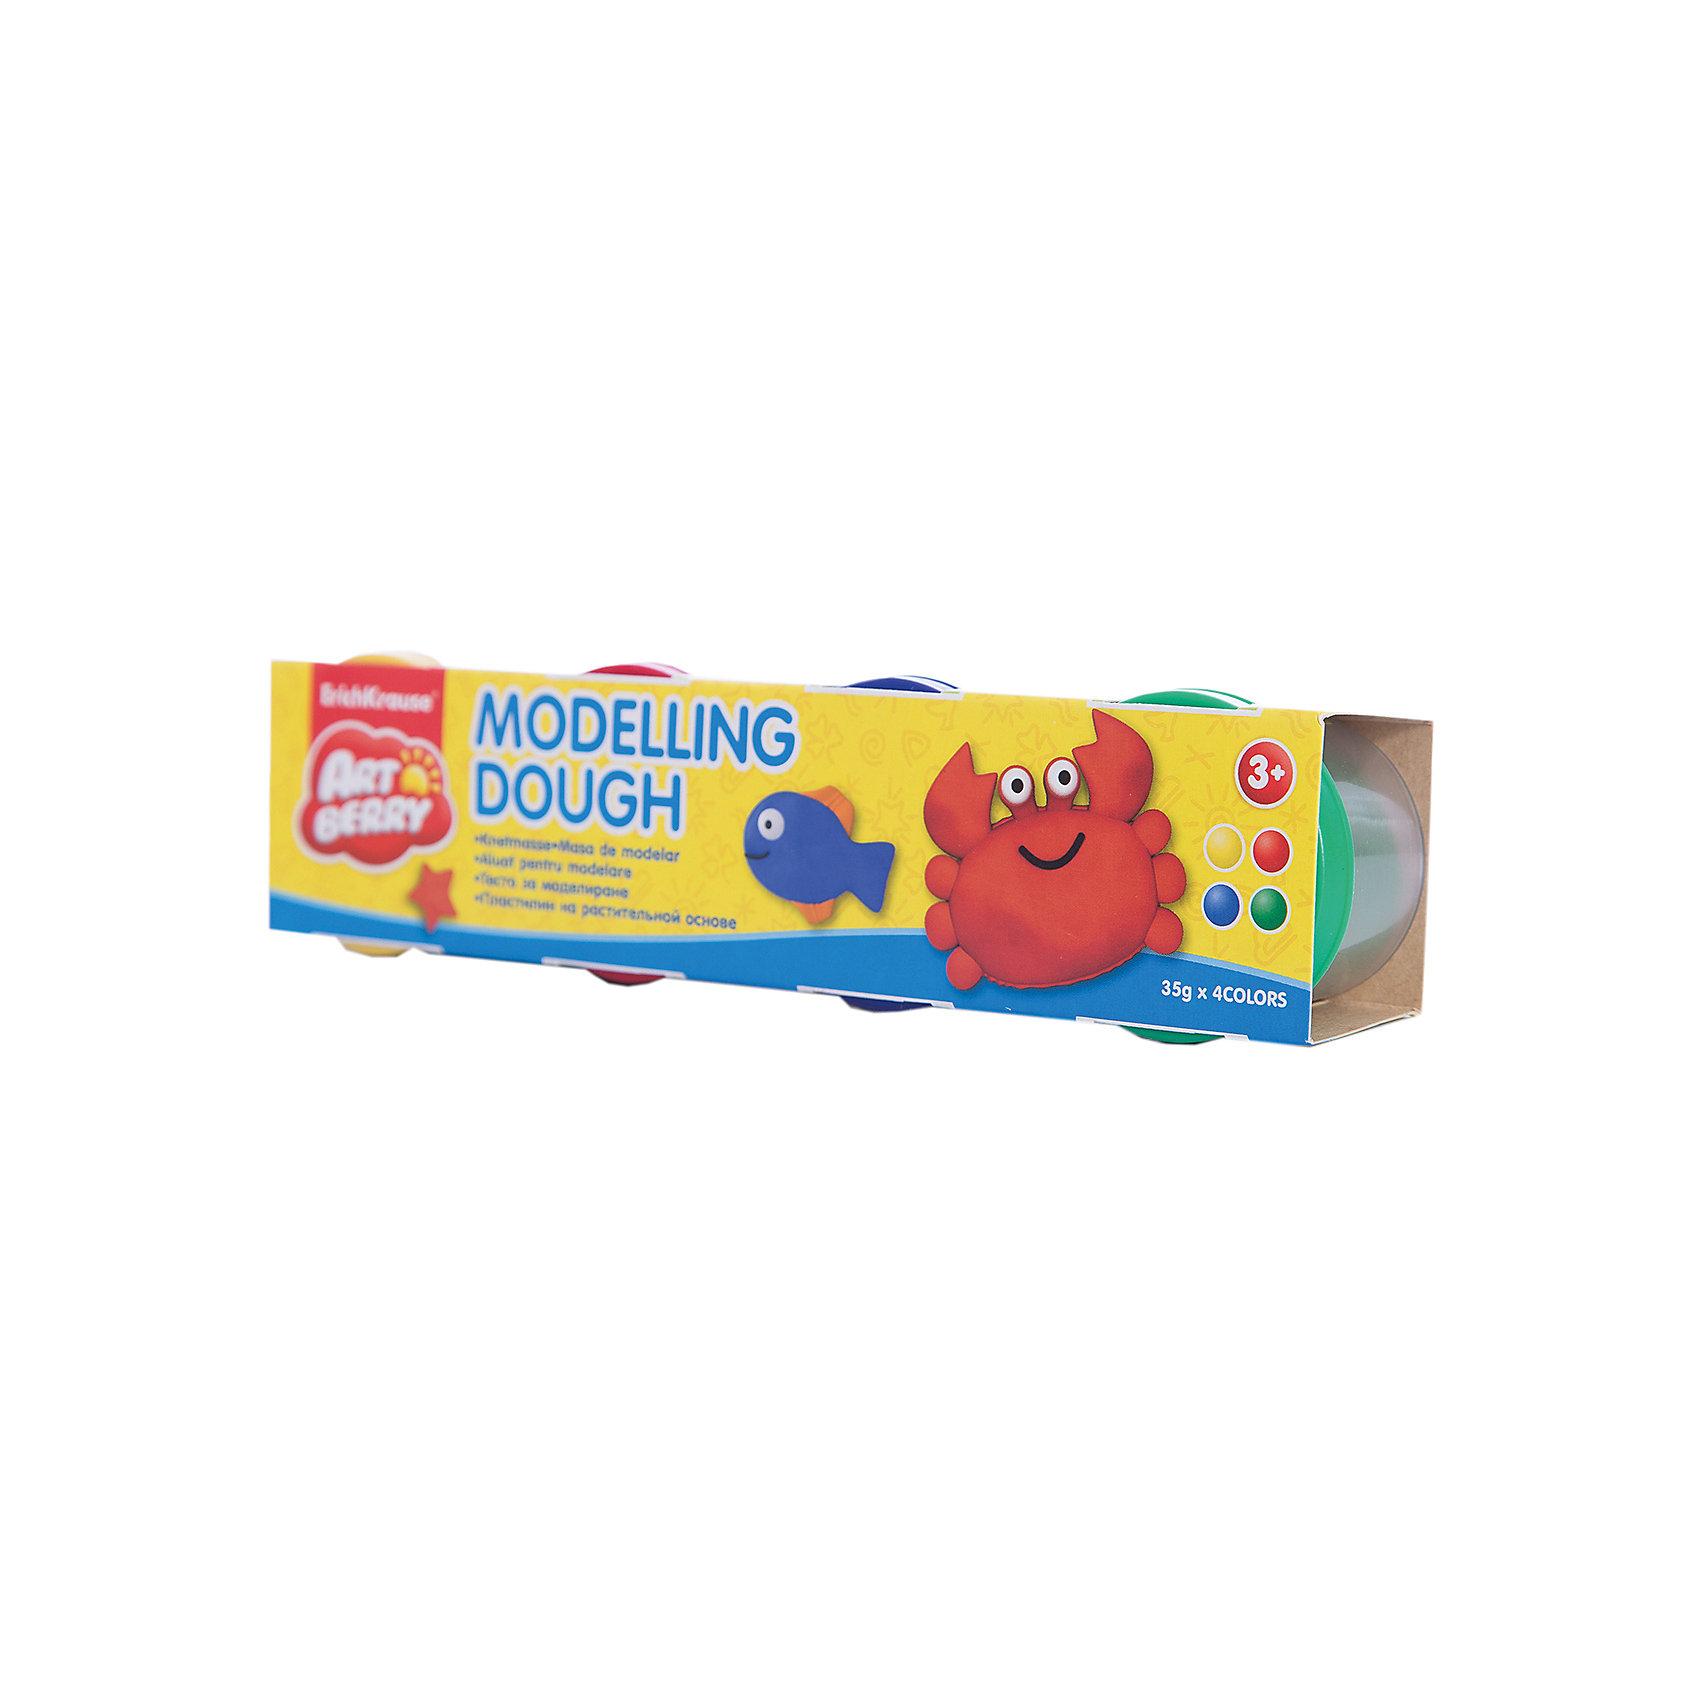 Пластилин на растительной основе Modelling Dough №1, 4 цвета по 35гЛепка<br>Пластилин на растит. основе Modelling Dough №1, 4 бан/35г карт.рукав<br><br>Ширина мм: 220<br>Глубина мм: 40<br>Высота мм: 45<br>Вес г: 193<br>Возраст от месяцев: 60<br>Возраст до месяцев: 216<br>Пол: Унисекс<br>Возраст: Детский<br>SKU: 5409324